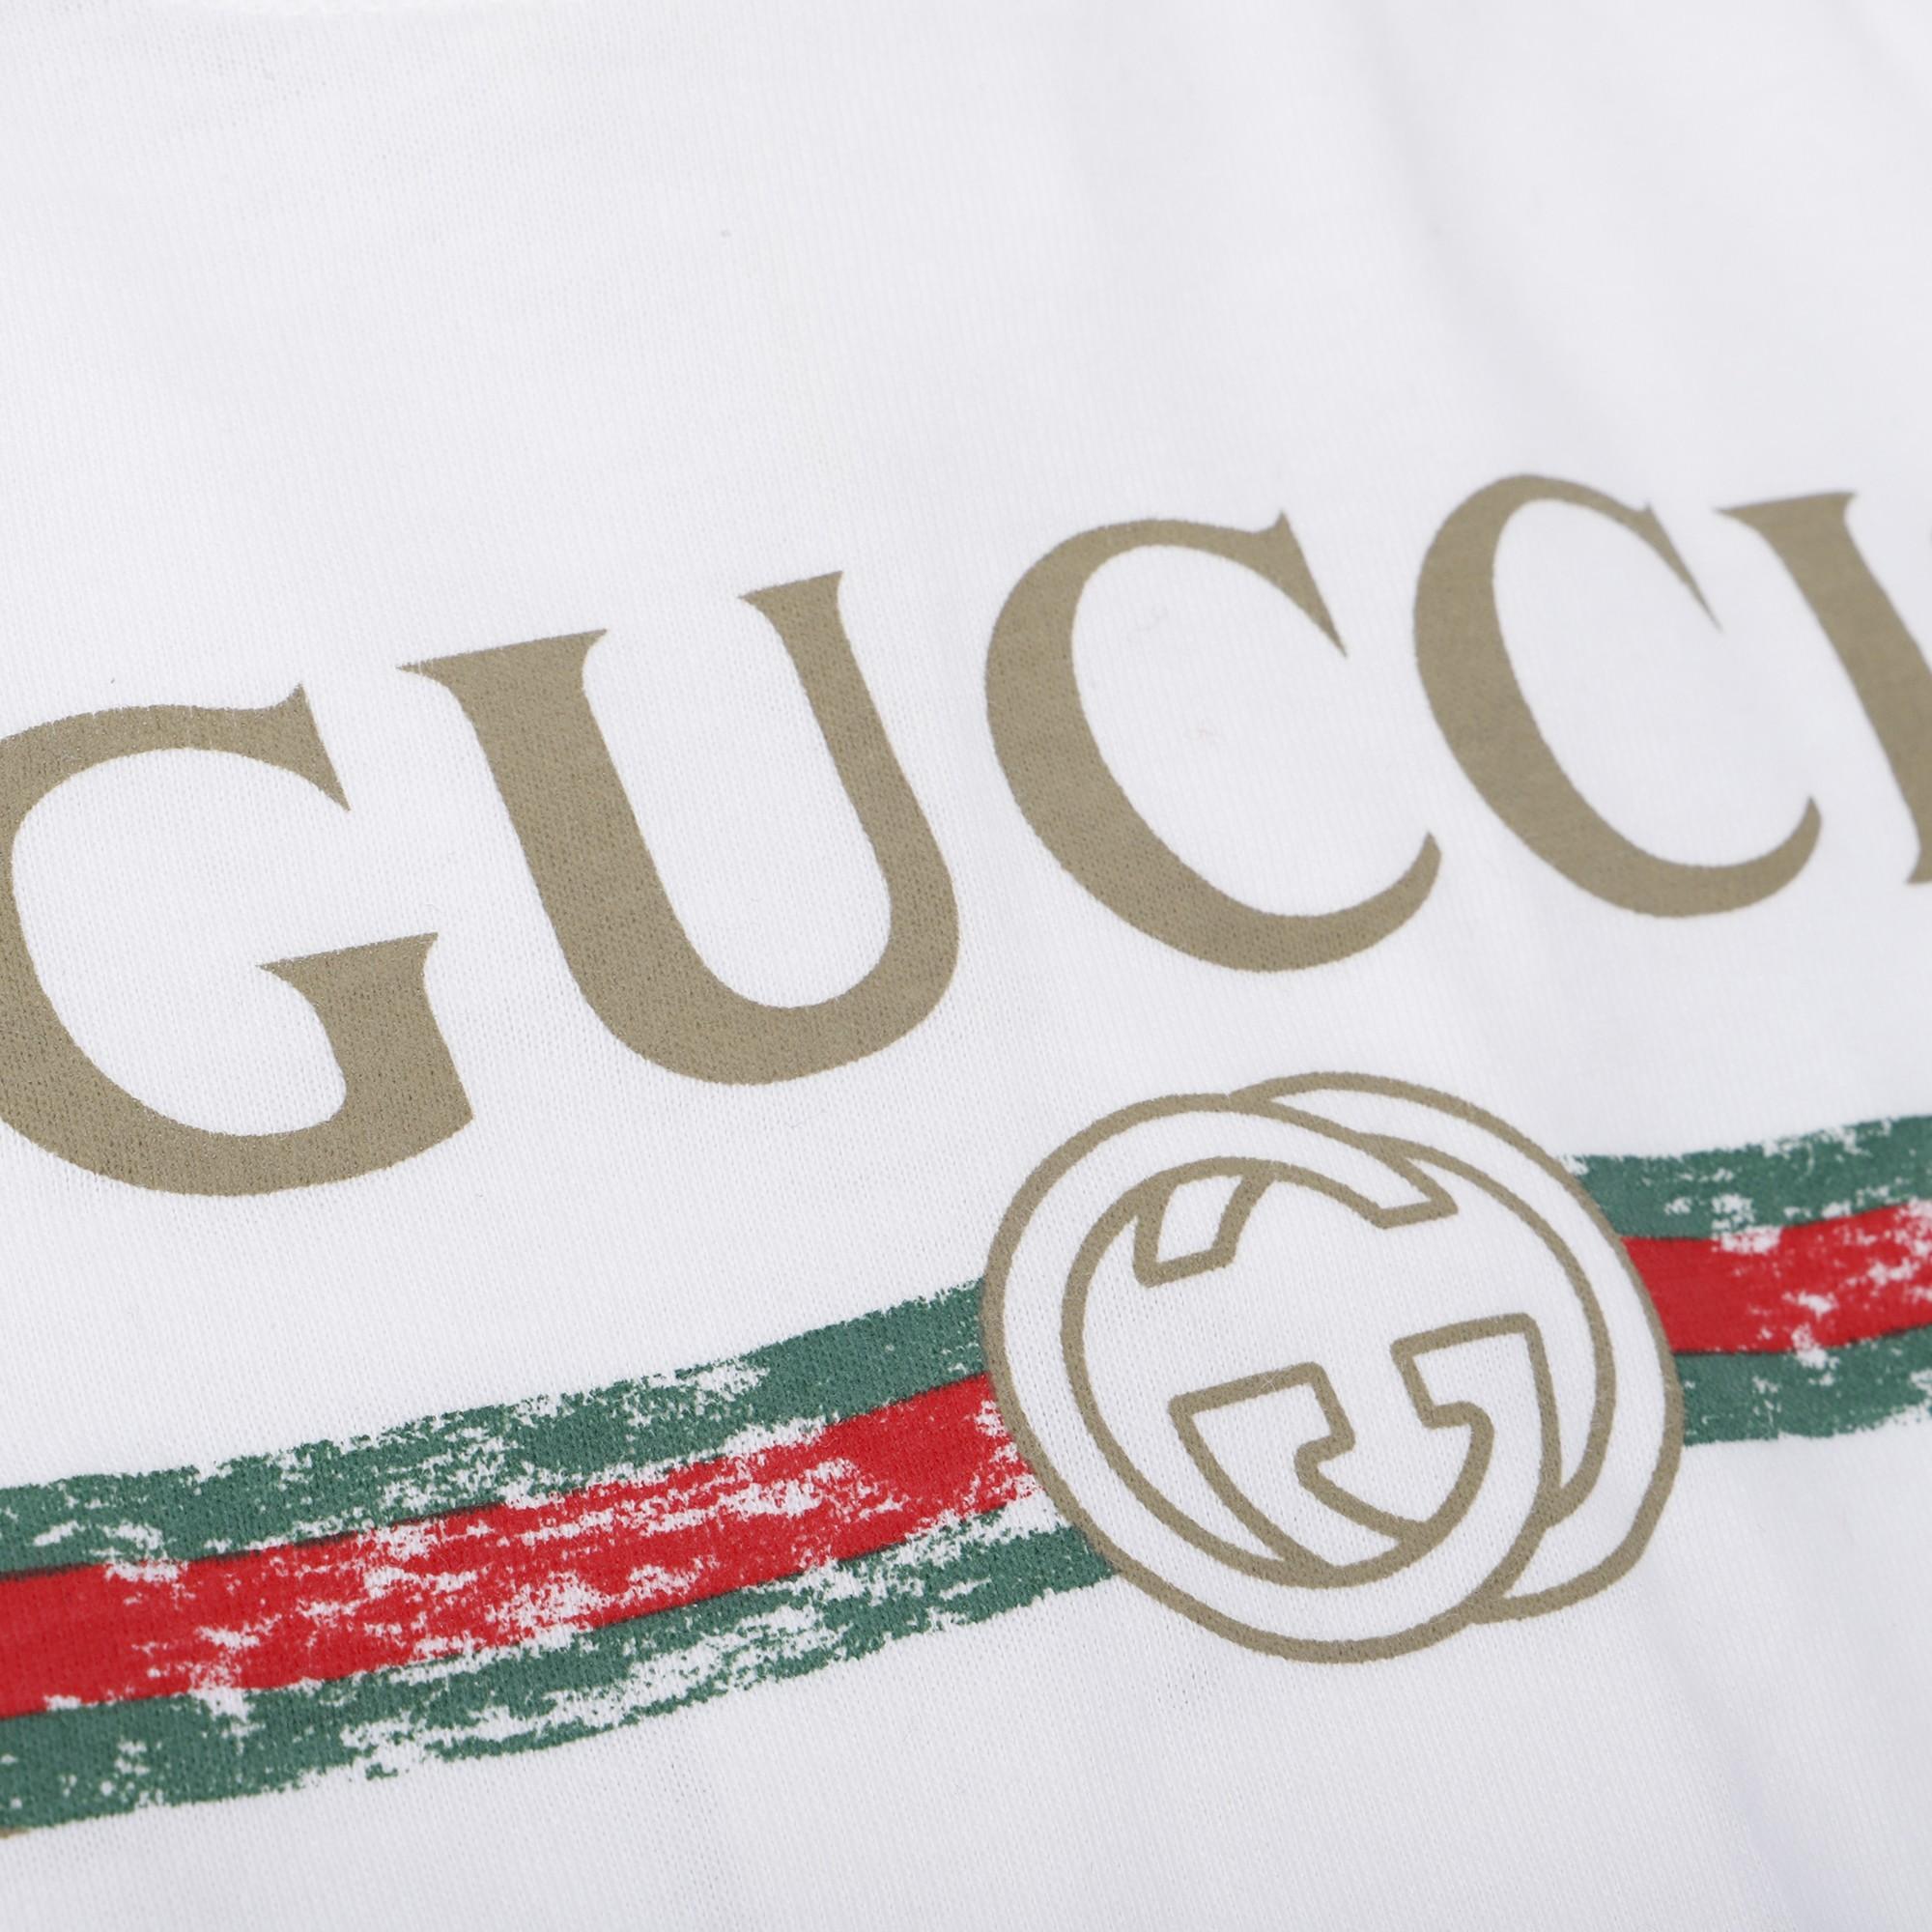 Gucci Baby Retro Logo Onesie In White Bambini Fashion